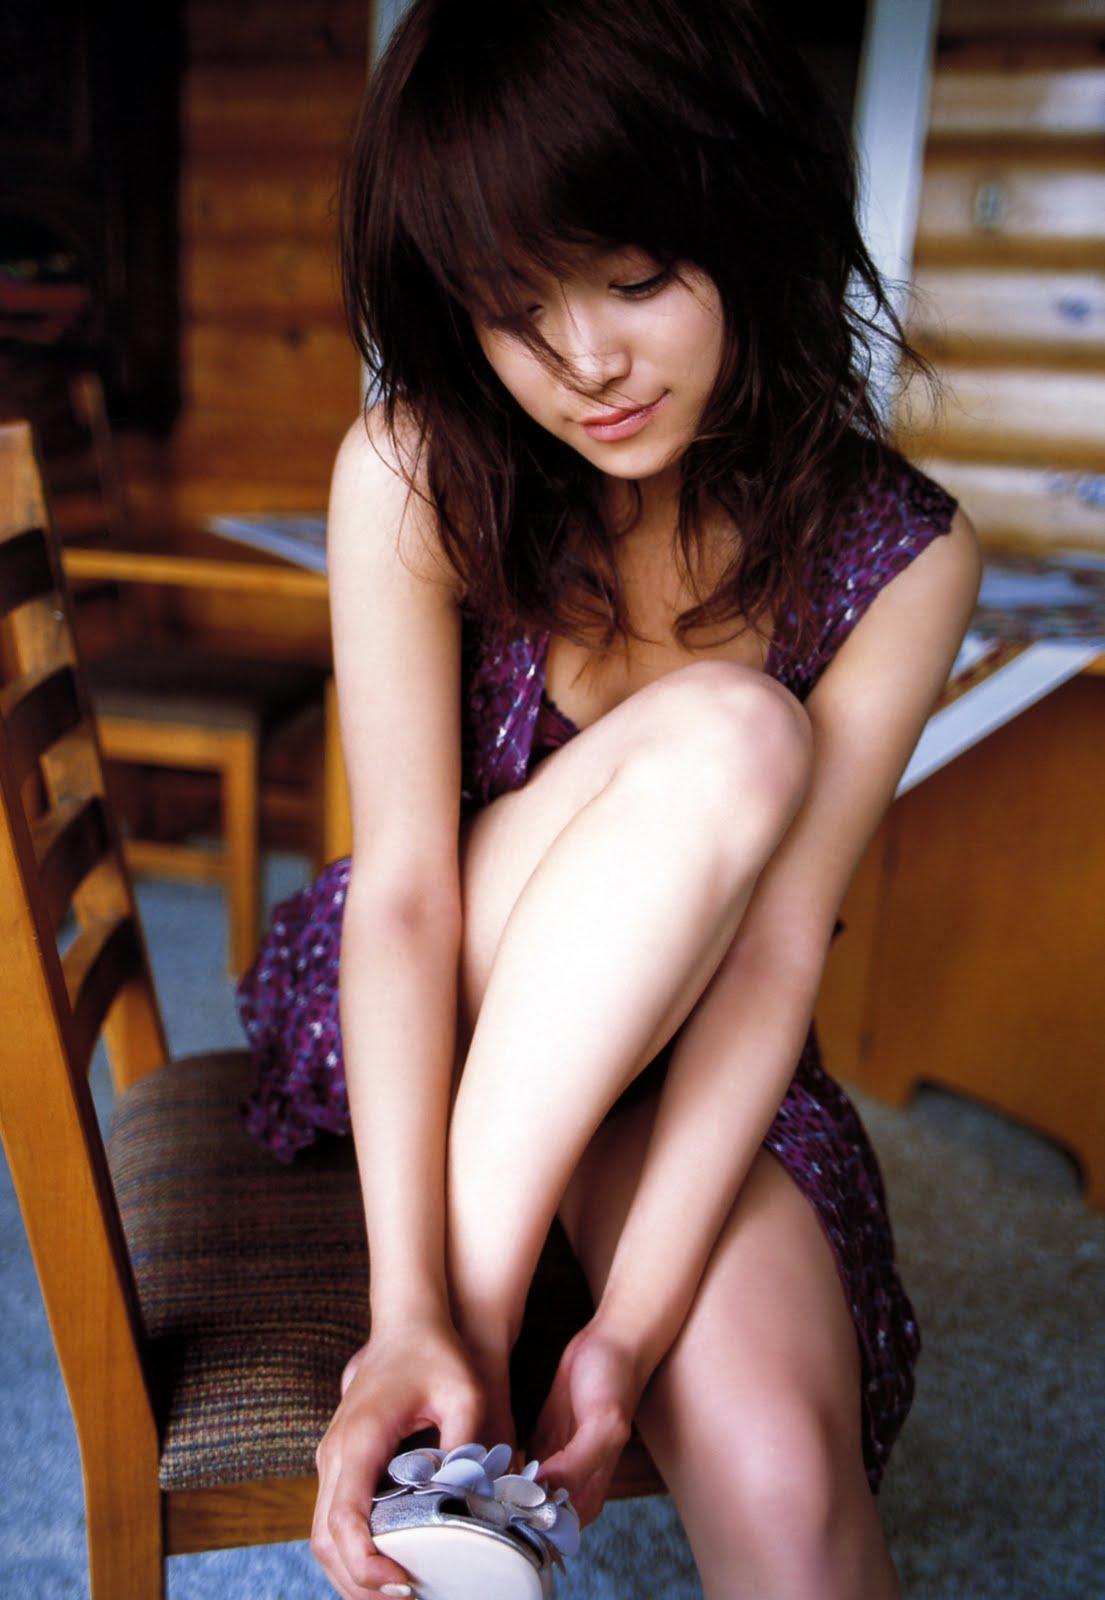 http://3.bp.blogspot.com/_AvqYvLHRAxM/SwP214XW-aI/AAAAAAAADiI/GDc4fhpTVn0/s1600/idol_eri_kamei_085.jpg